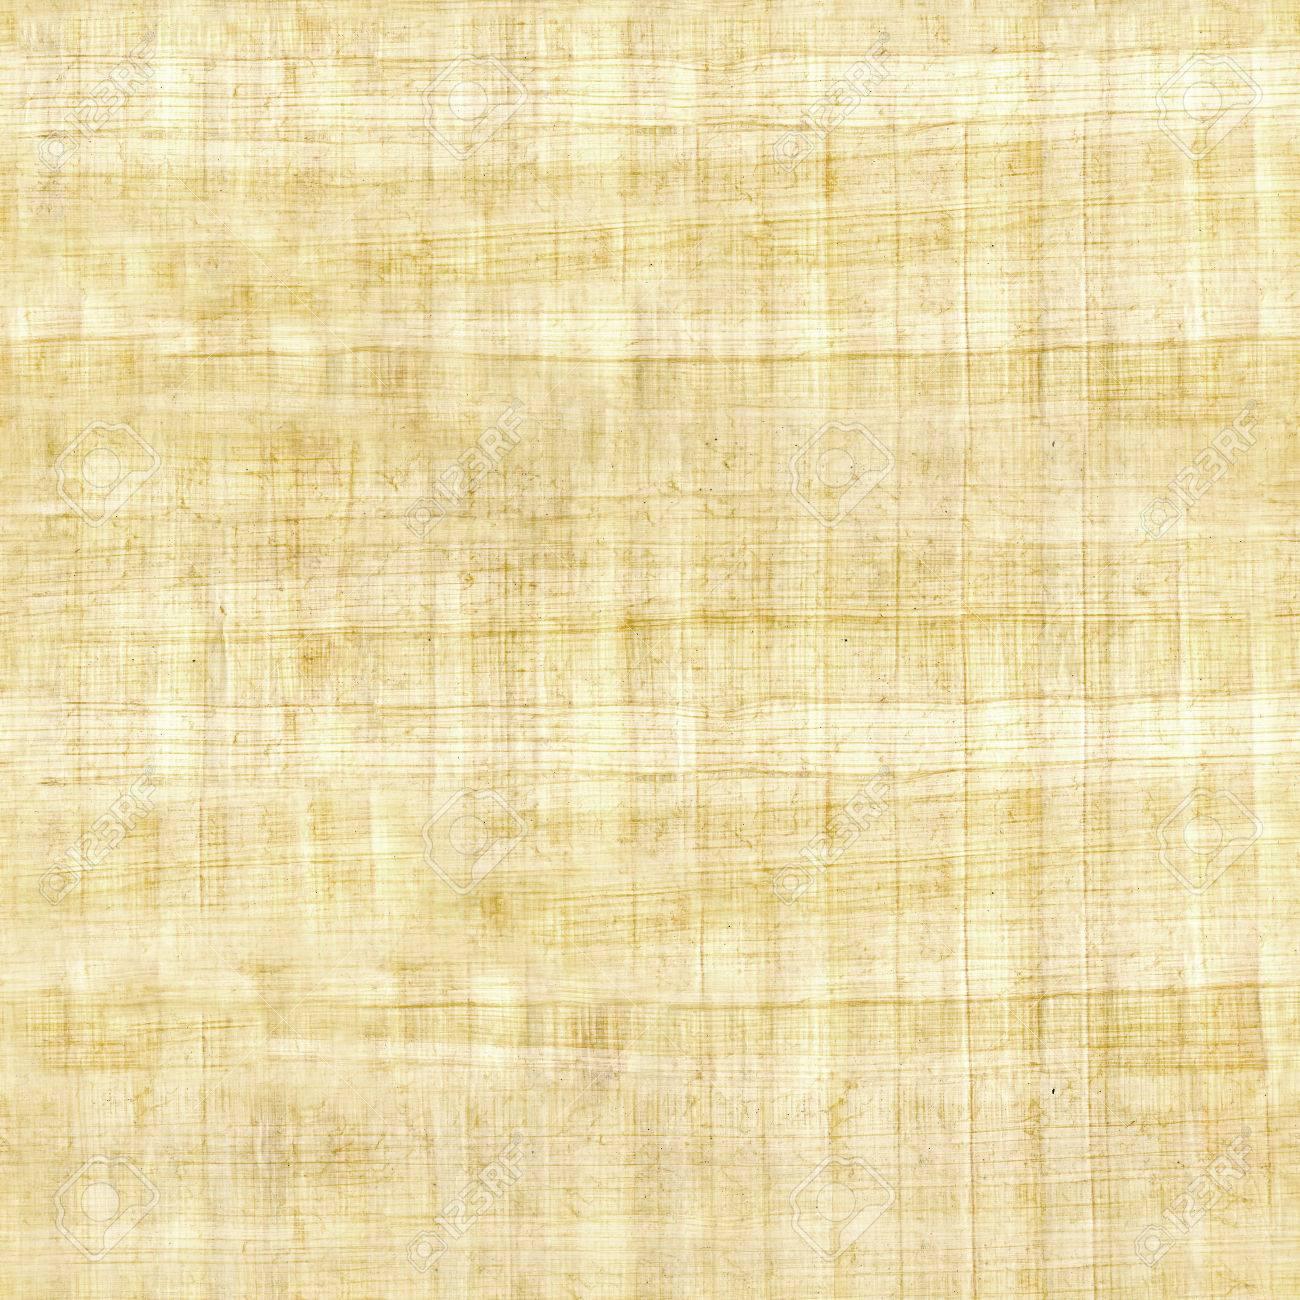 papyrus texture - seamless pattern - ridged surface - 40191685